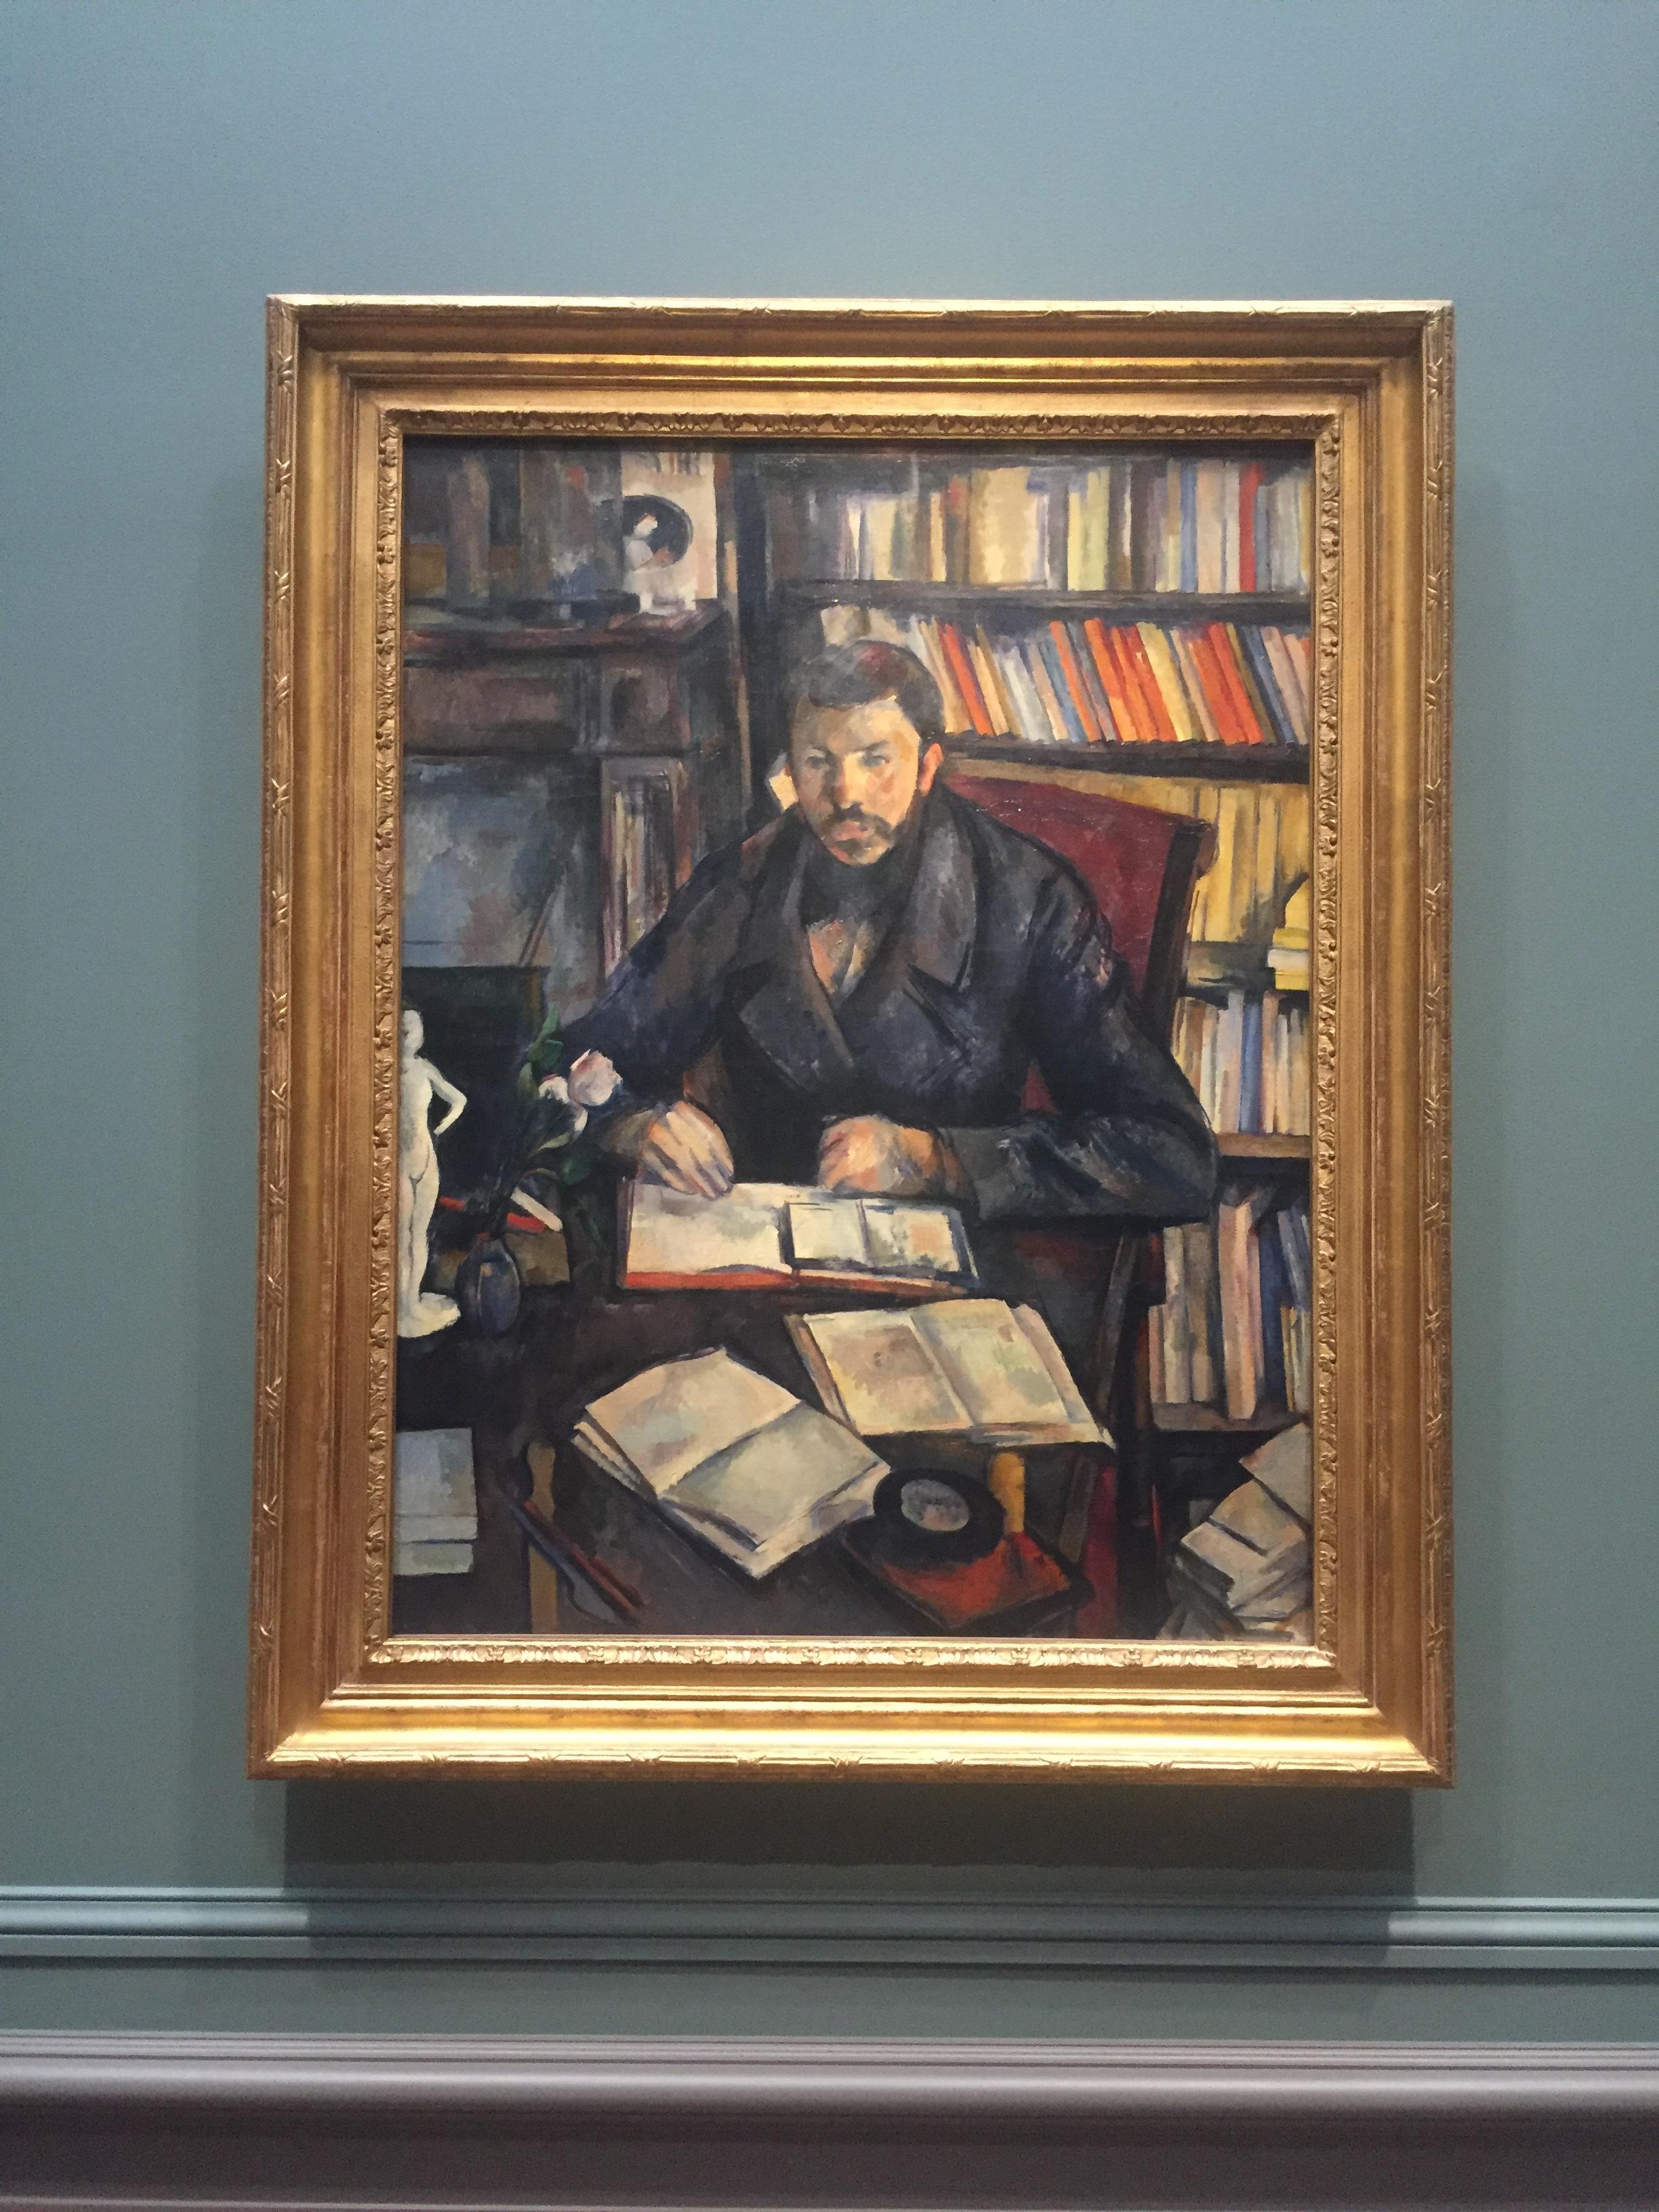 cezanne portrait of a man in his study.JPG